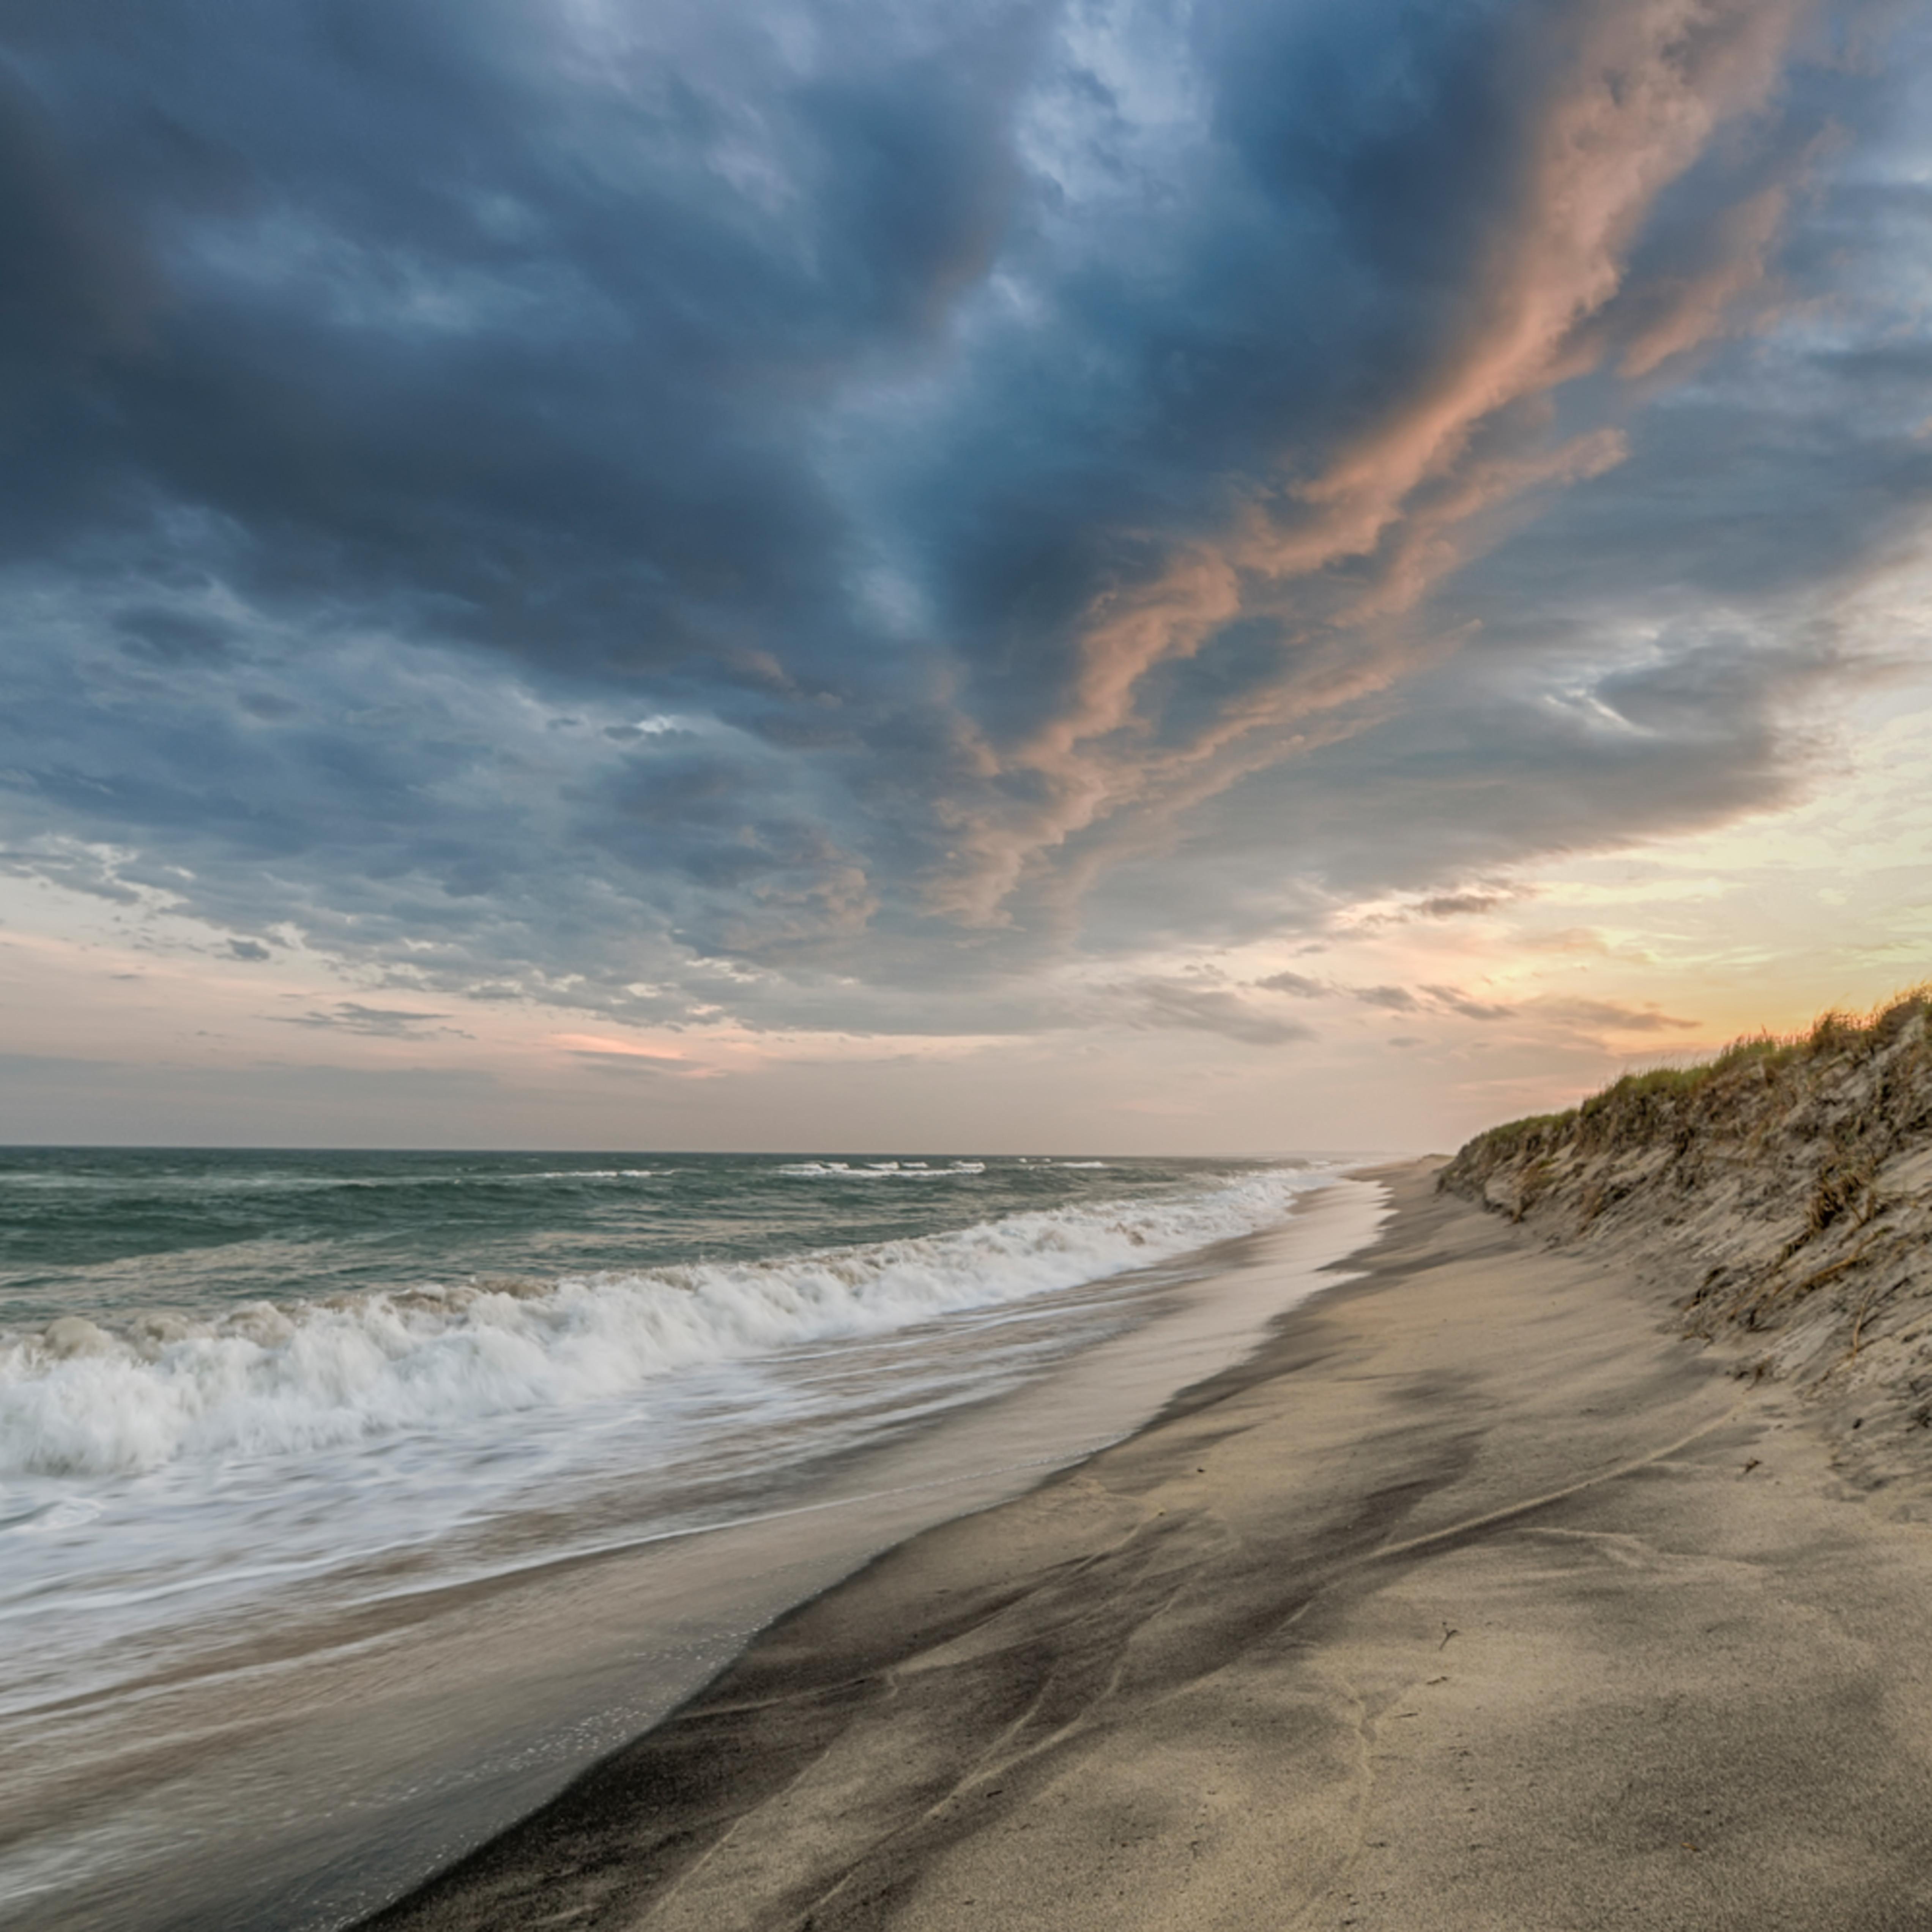 Long point beach clouds 1 kbi93i